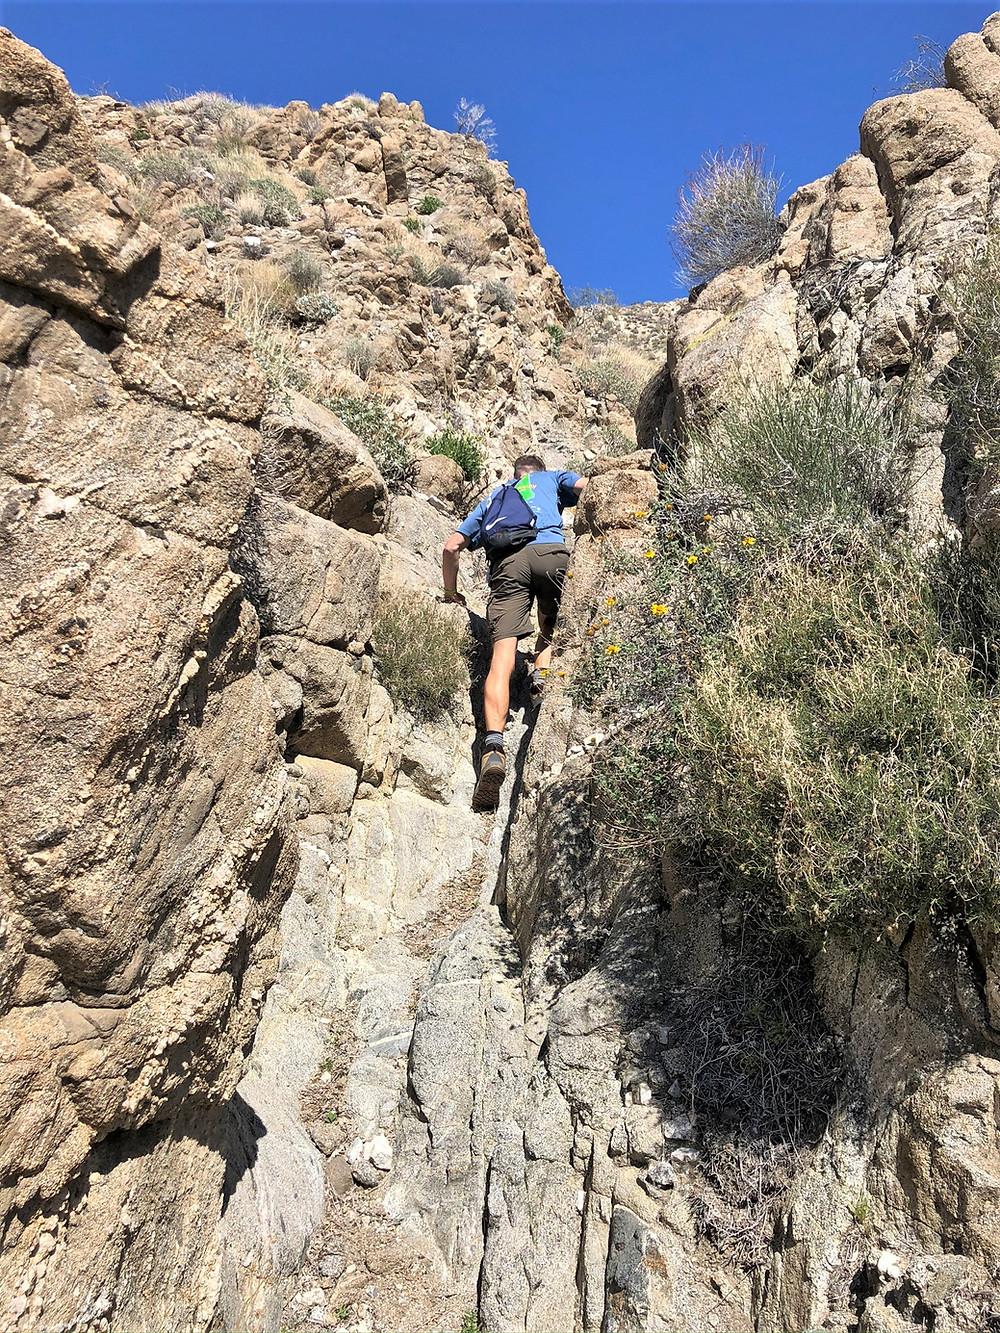 Scrambling up rock face in Swiss Canyon in Little San Bernardino mountains